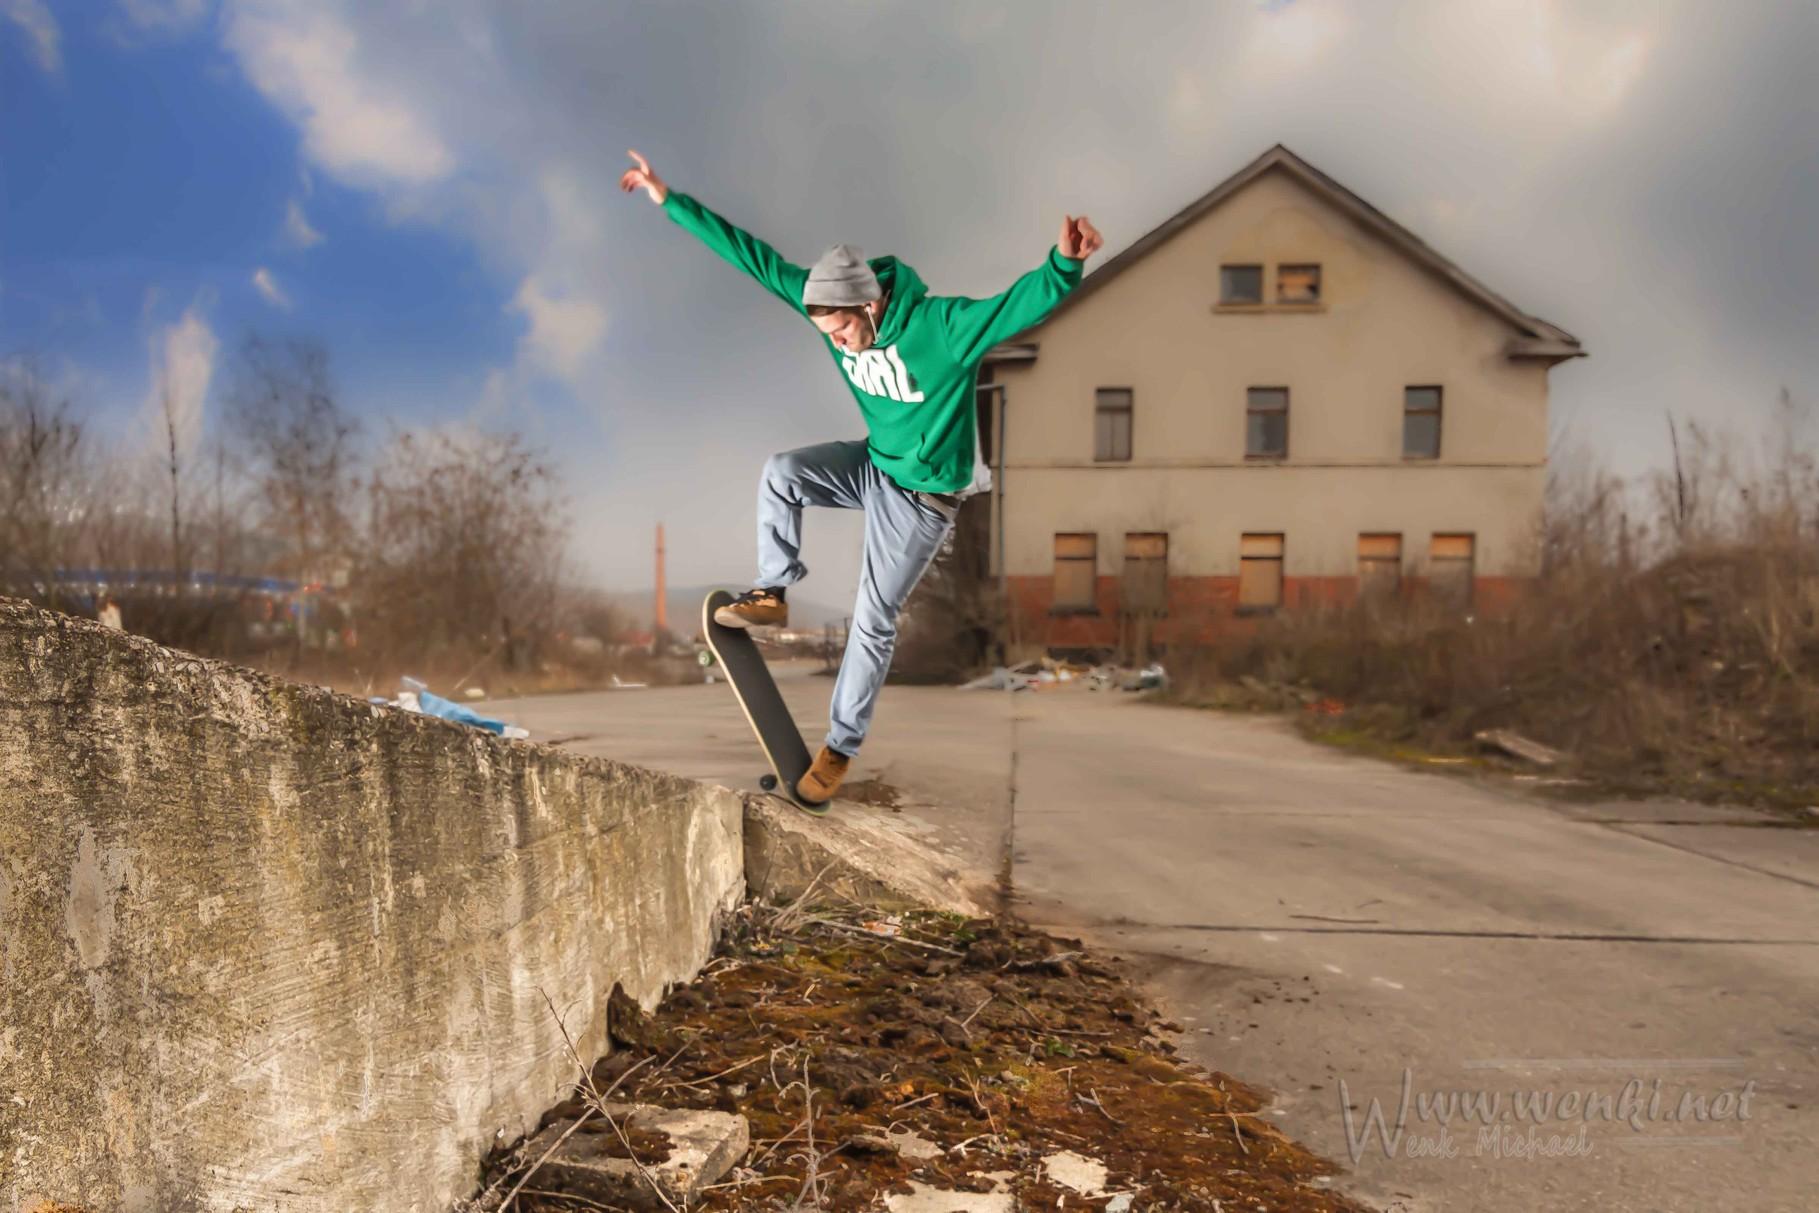 Skaten, egal wo